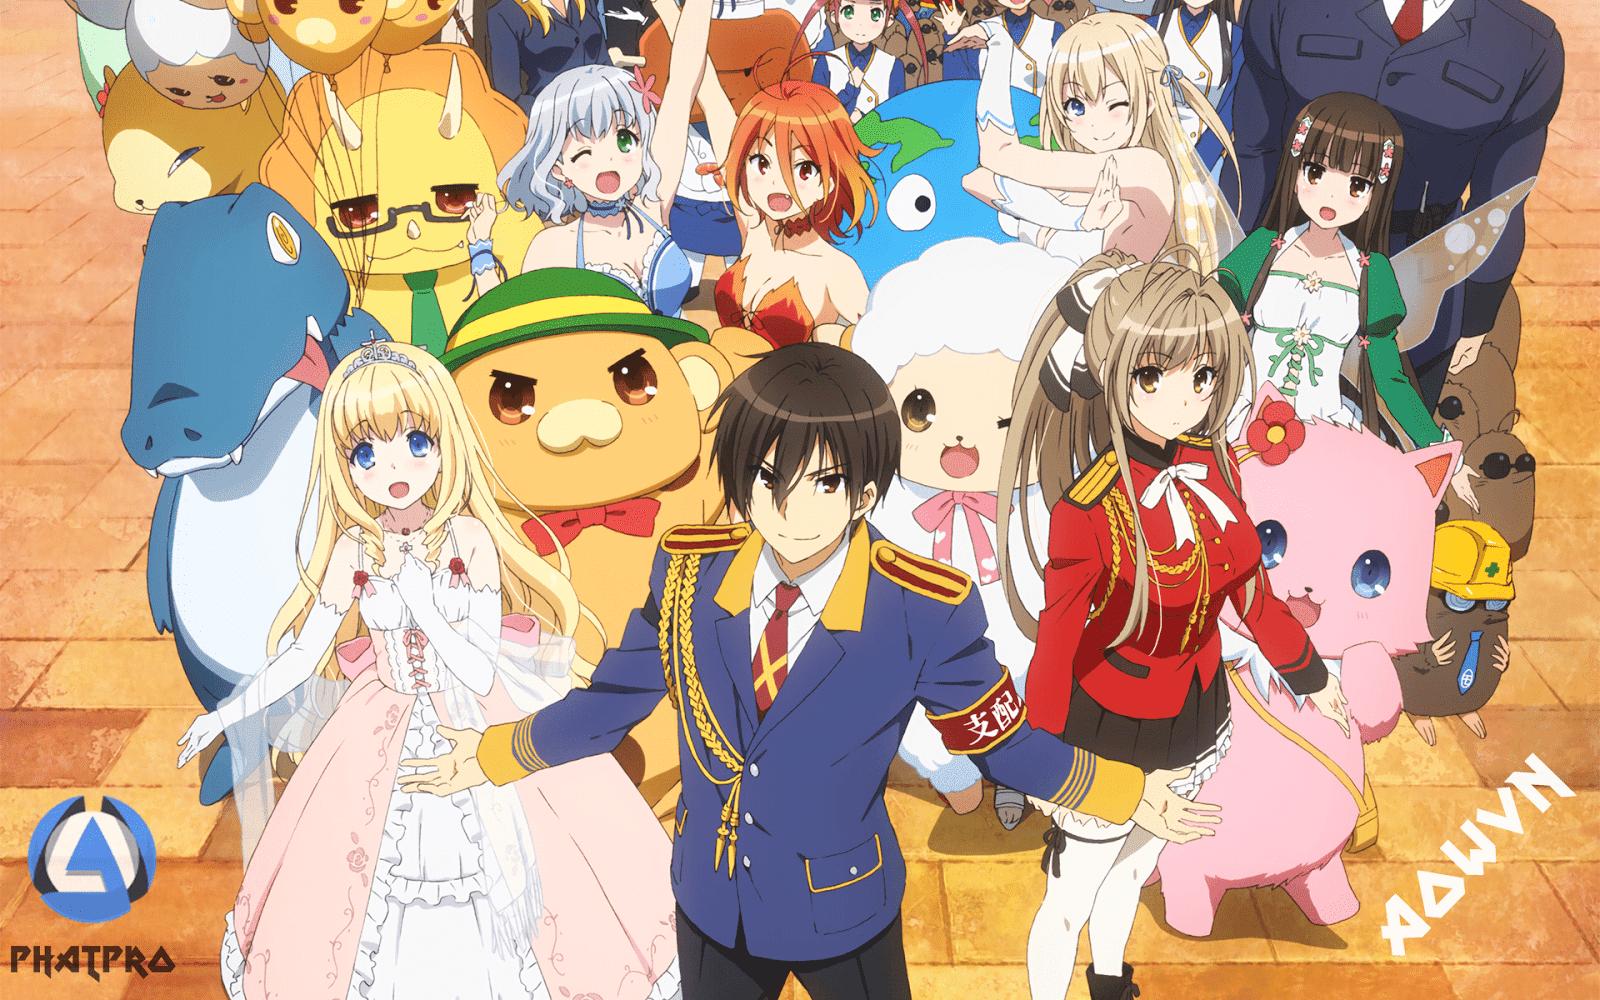 Amagi%2B %2BPhatpro%2B%25281%2529 min - [ Anime 3gp Mp4 ] Amagi Brilliant Park BD + Ova + SP | Vietsub - Cực Hài - Cực Moe